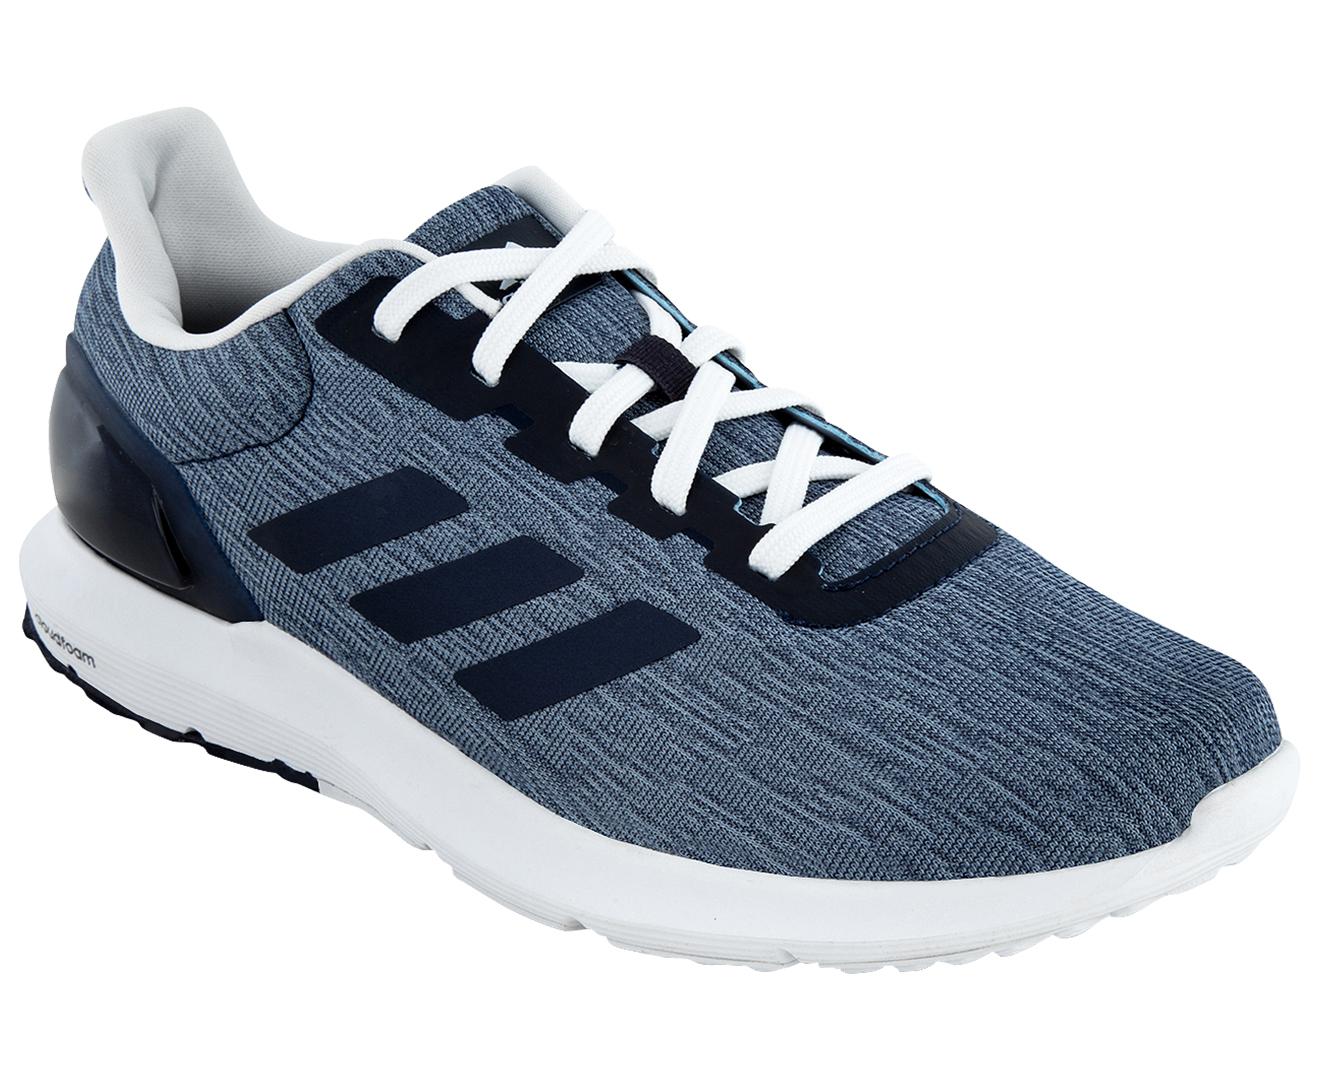 e45d8a017d180c Adidas Women s Cosmic 2.0 Shoe - Collegiate Navy Track Blue